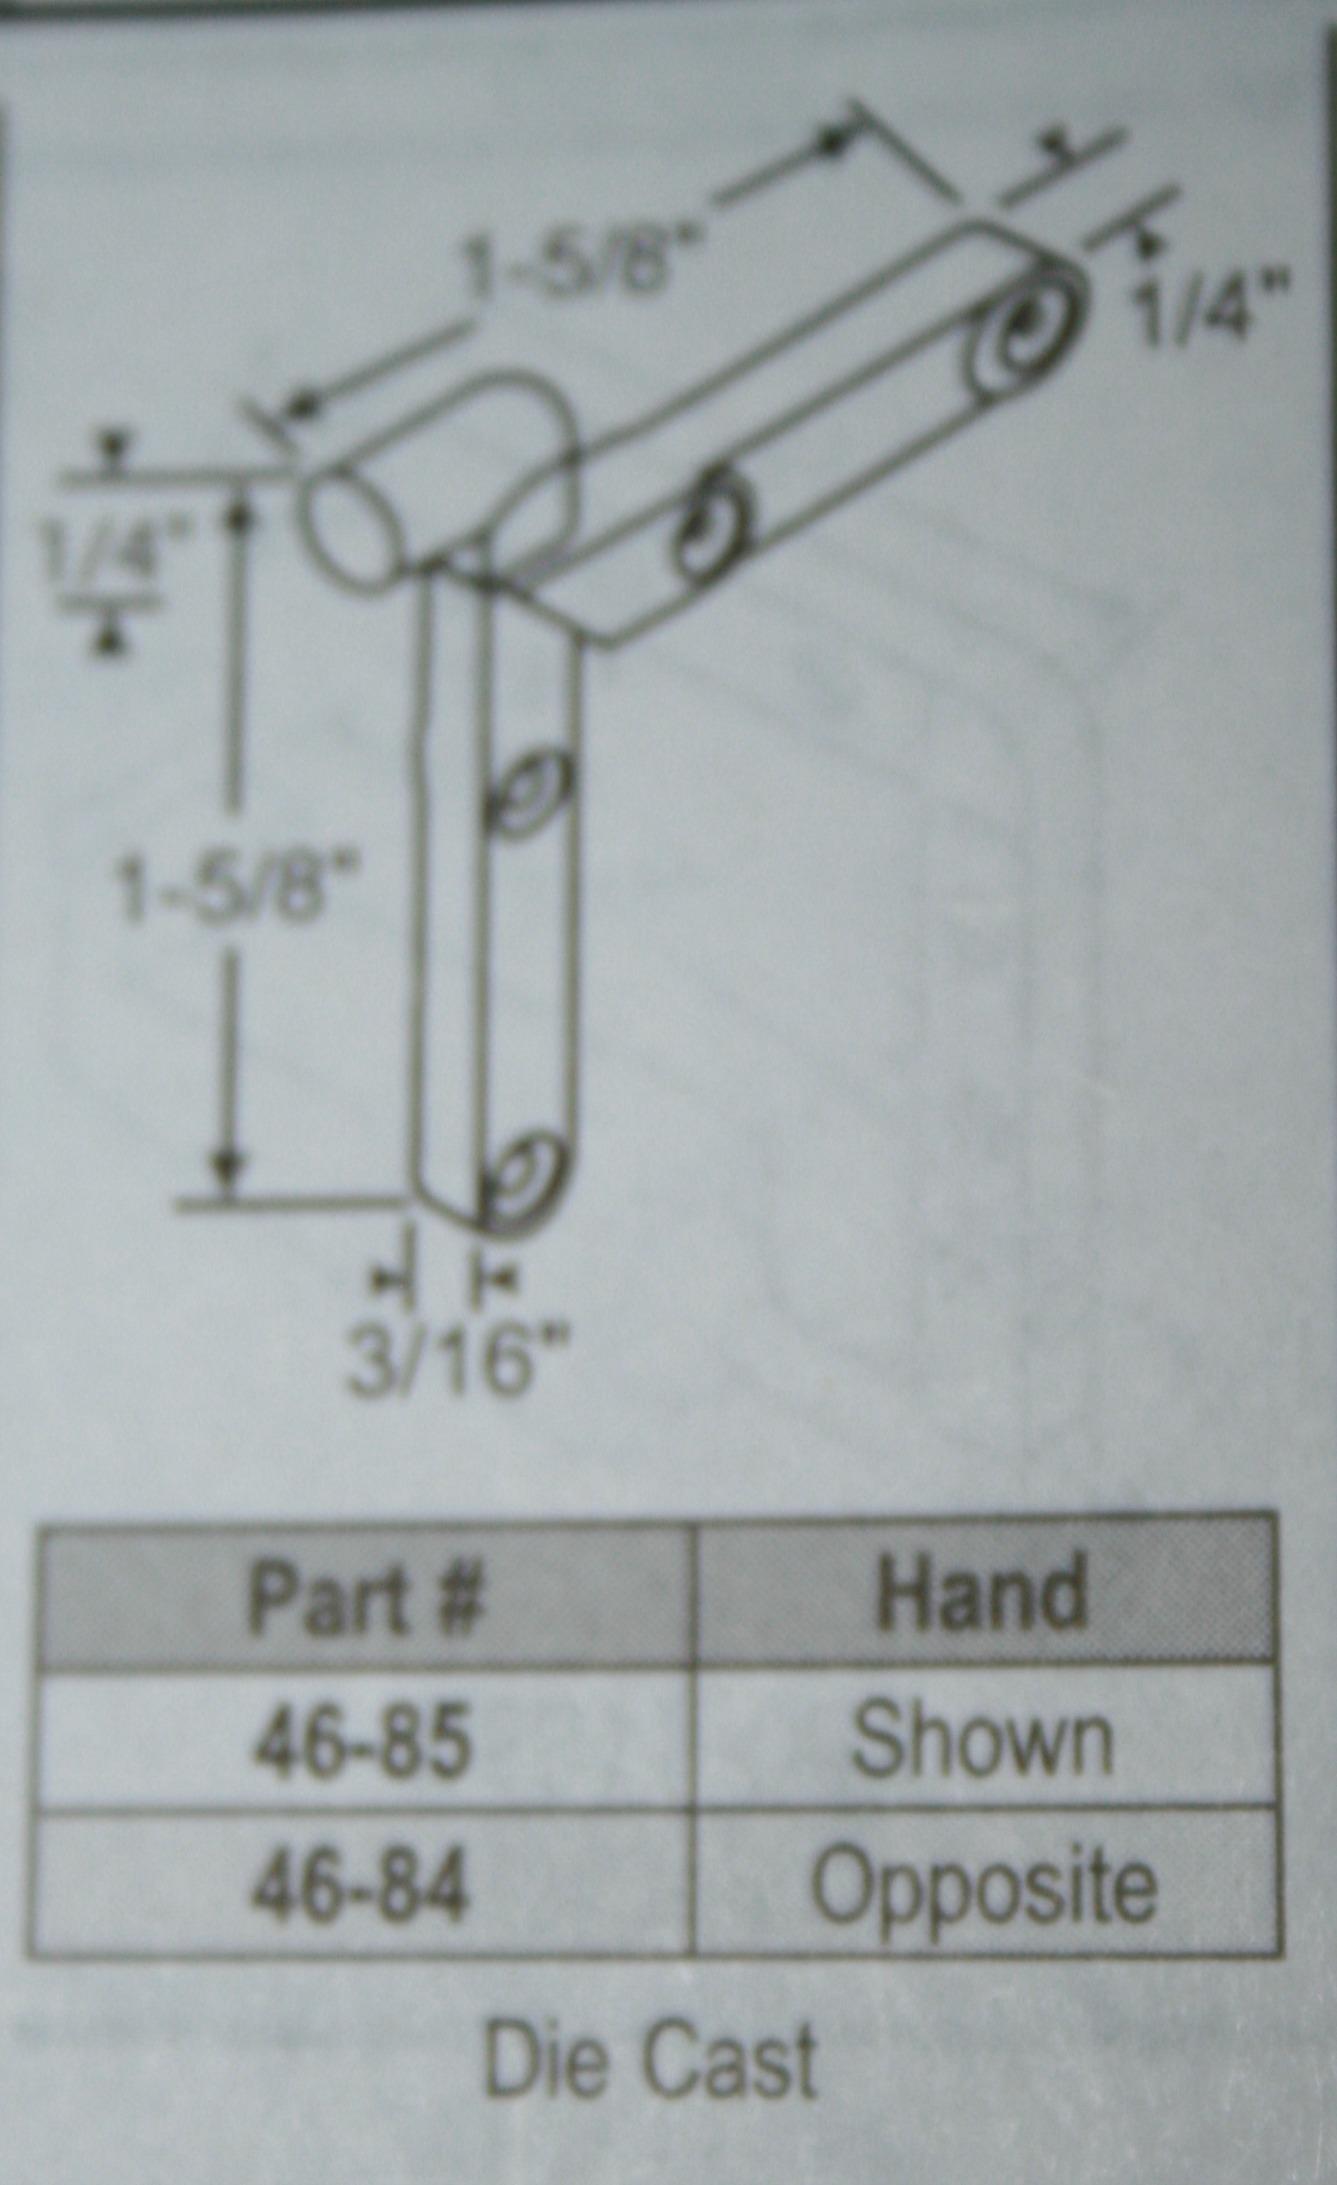 hight resolution of corner key 46 84 handed 1 5 8 x 1 5 8 die cast